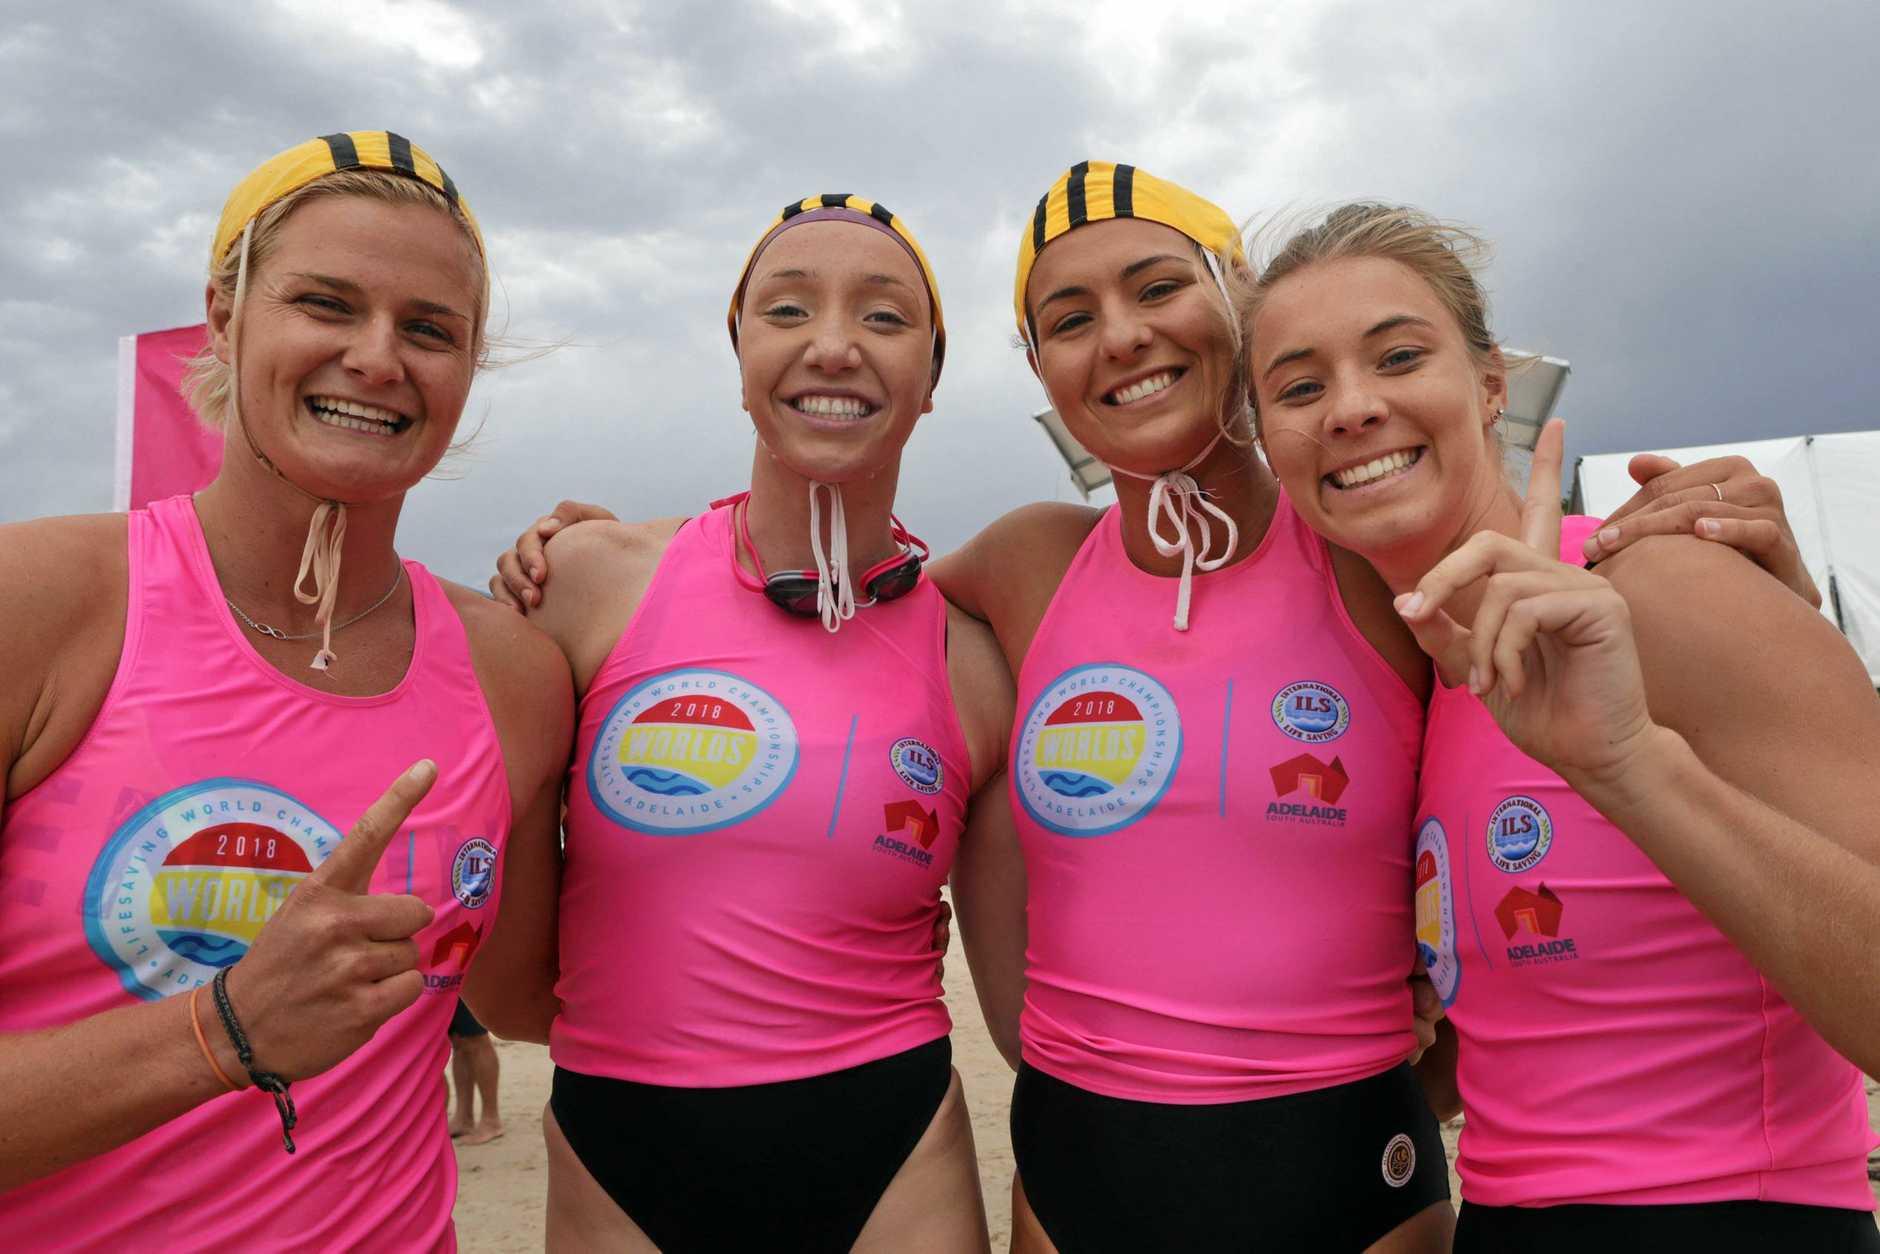 Alexandra Headland's Lani Pallister (swim), Alyssa Bull (ski), Olivia Heaton (board) and Tiarrn Raymond (run) won the Oceanwoman Relay at the Lifesaving World Championships on Saturday at Glenelg Beach in Adelaide.